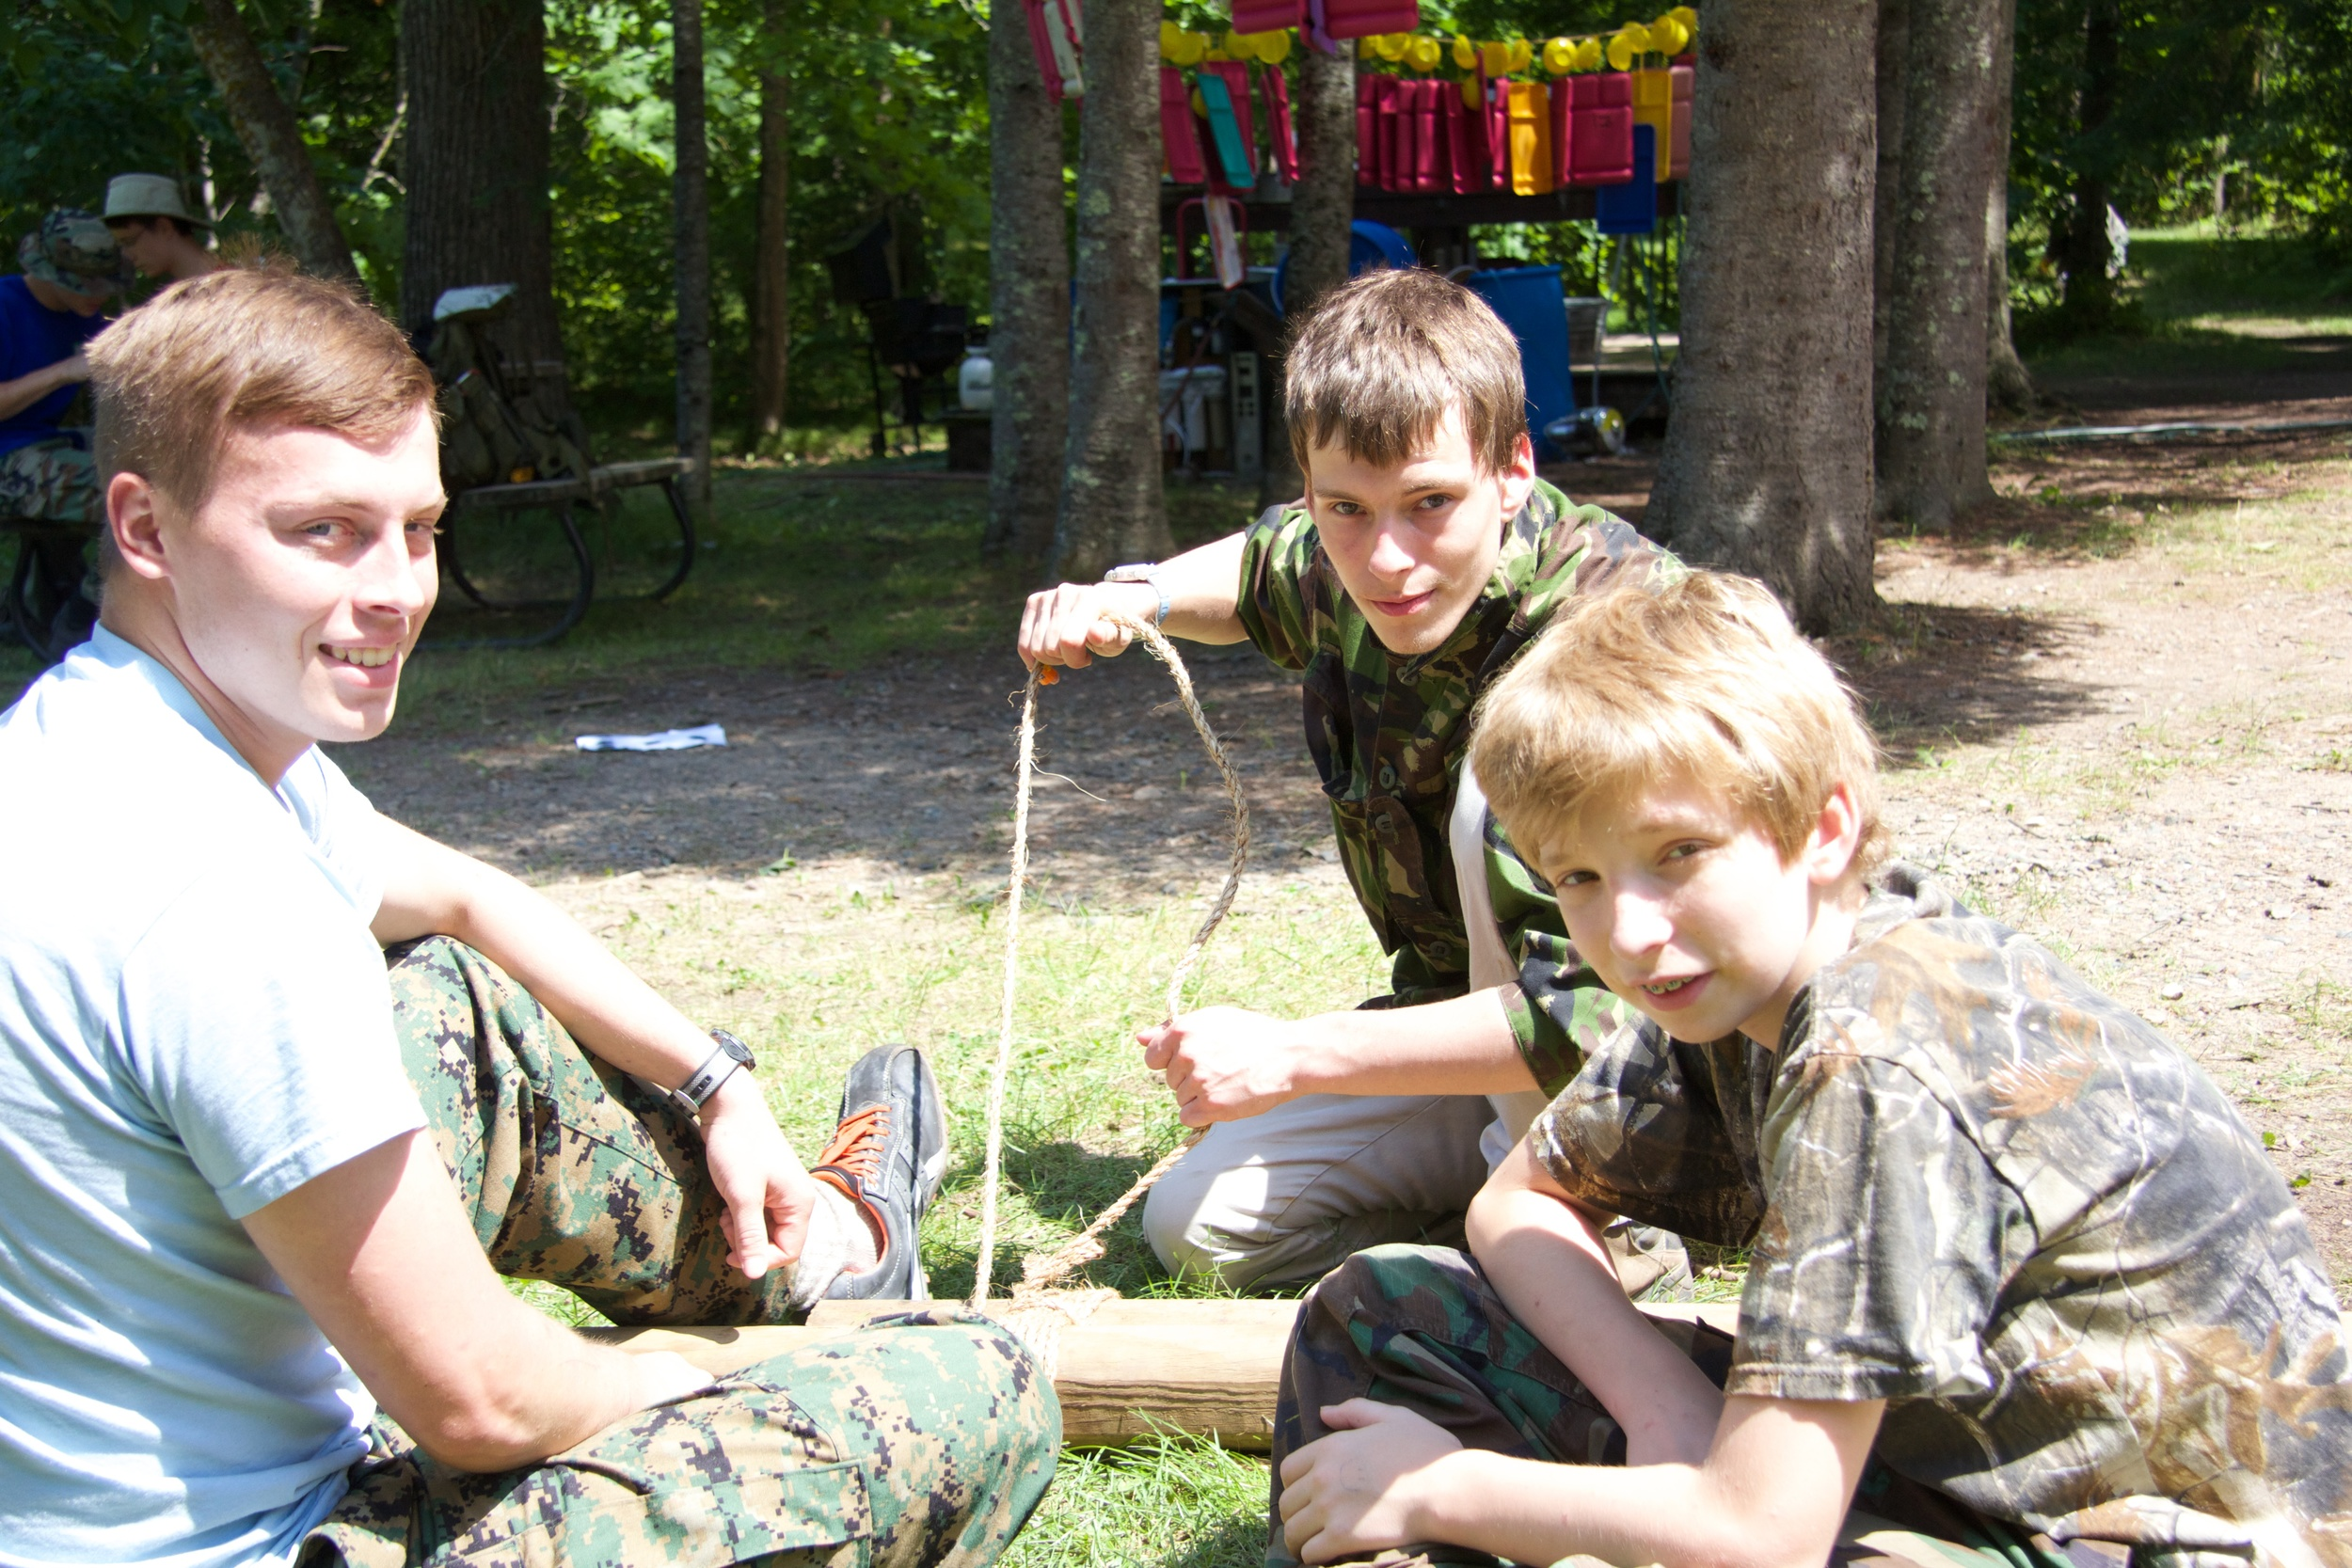 2014 Camp 2 522014 Camp 2 37IMG_0037.jpg